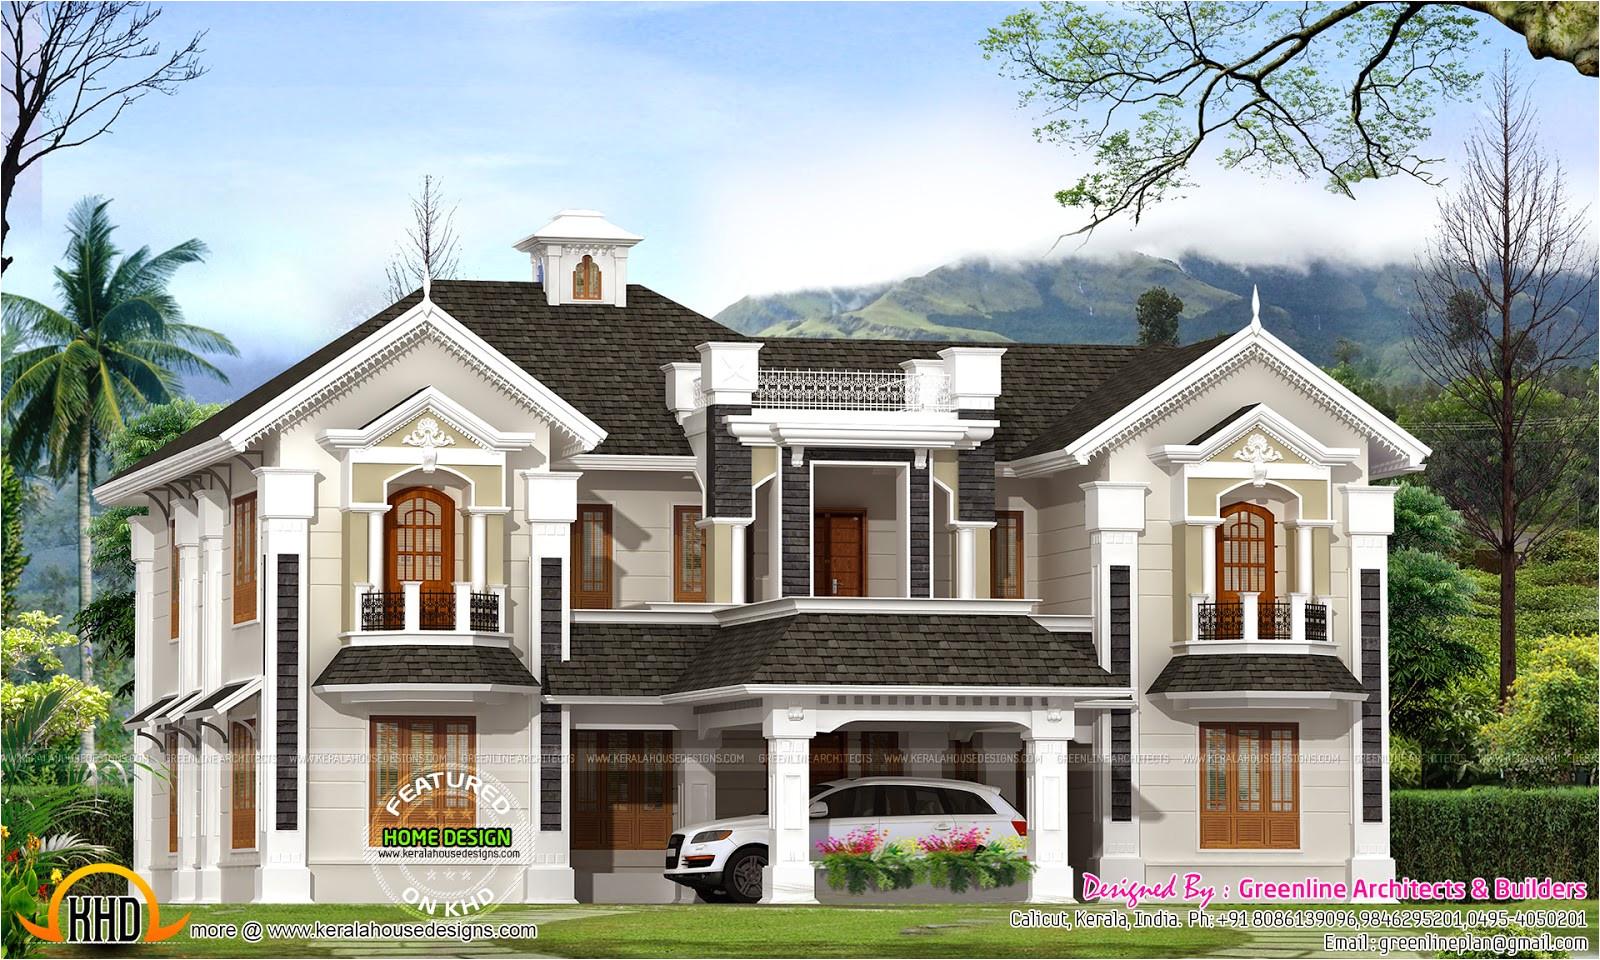 colonial style house kerala